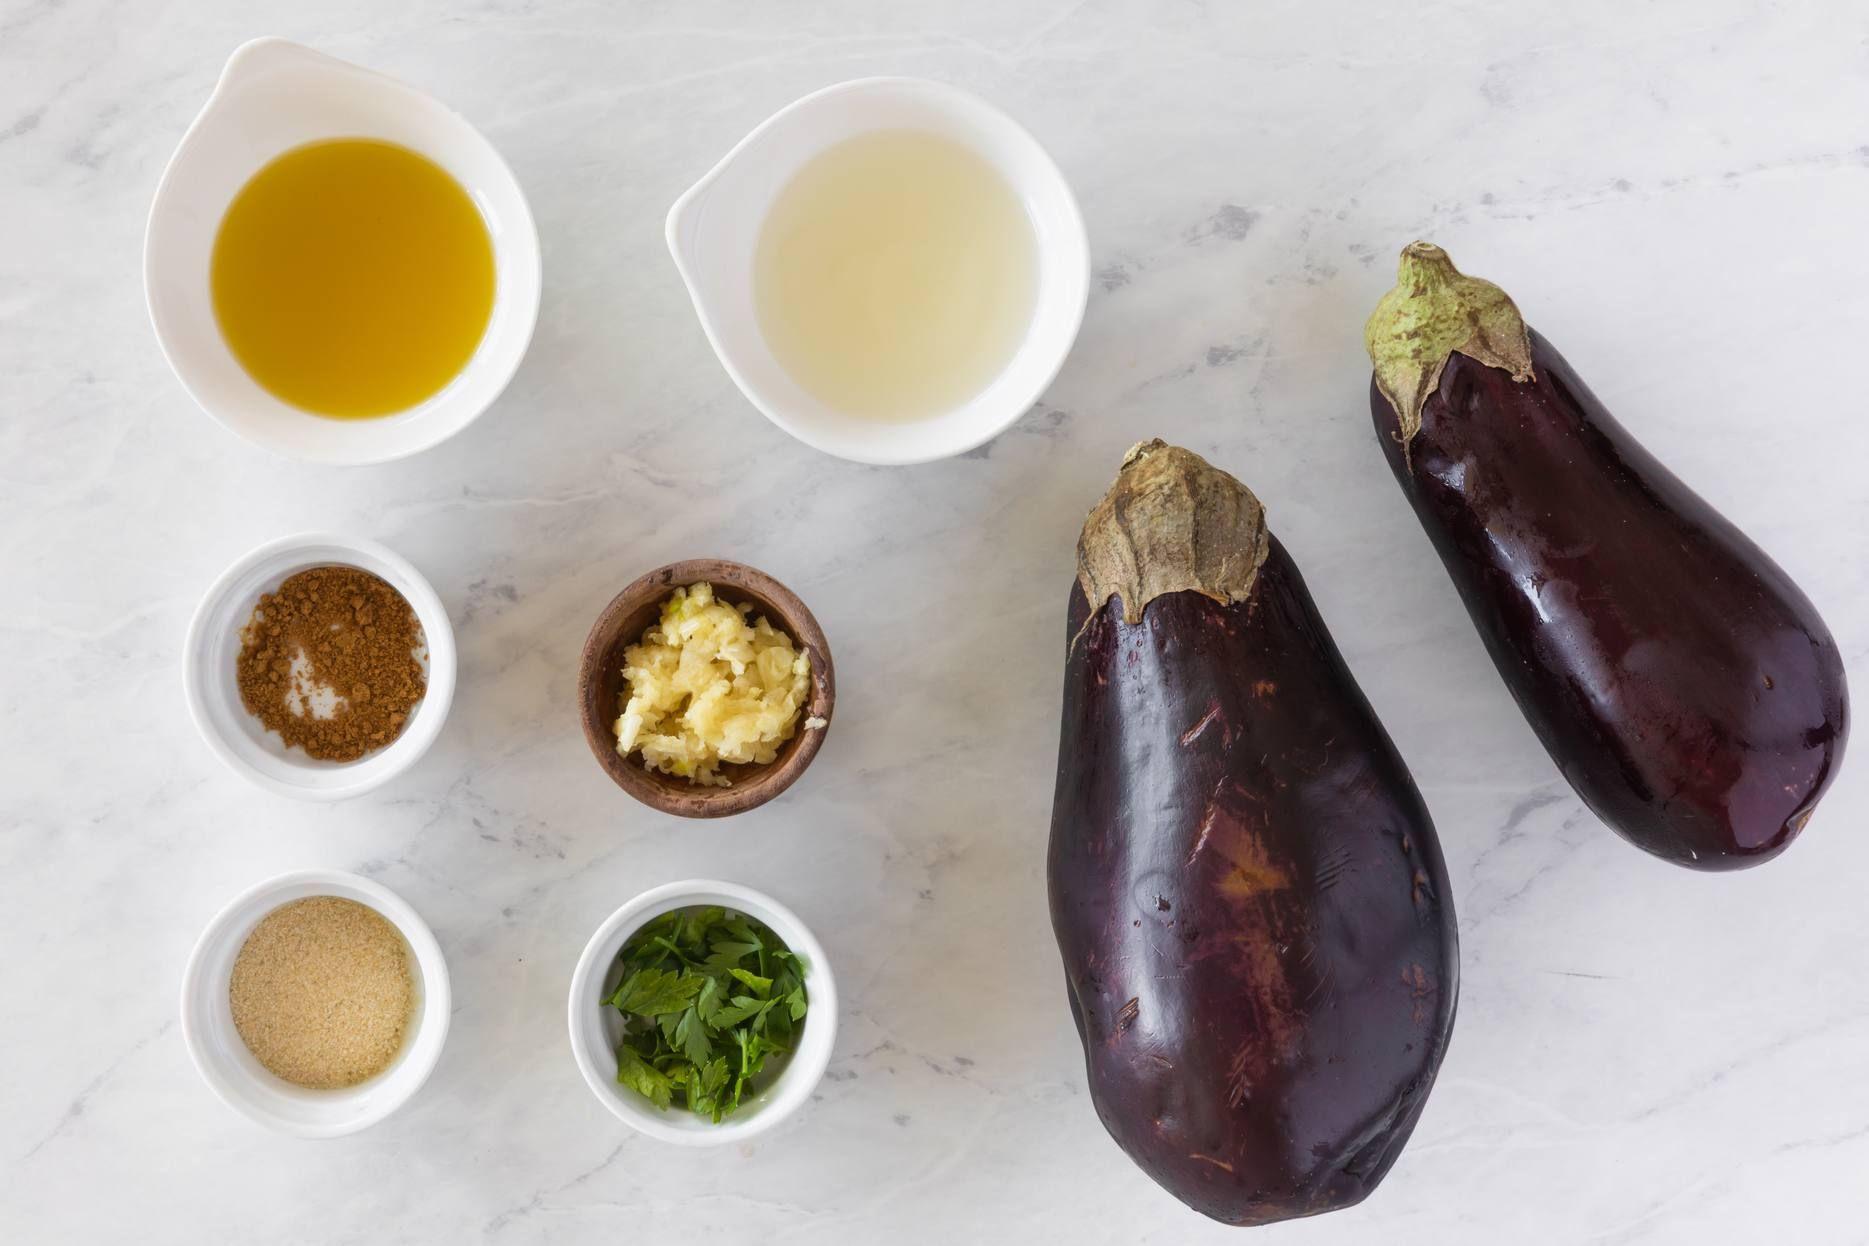 What's the Recipe for Vegan, Gluten-Free Baba Ganoush?